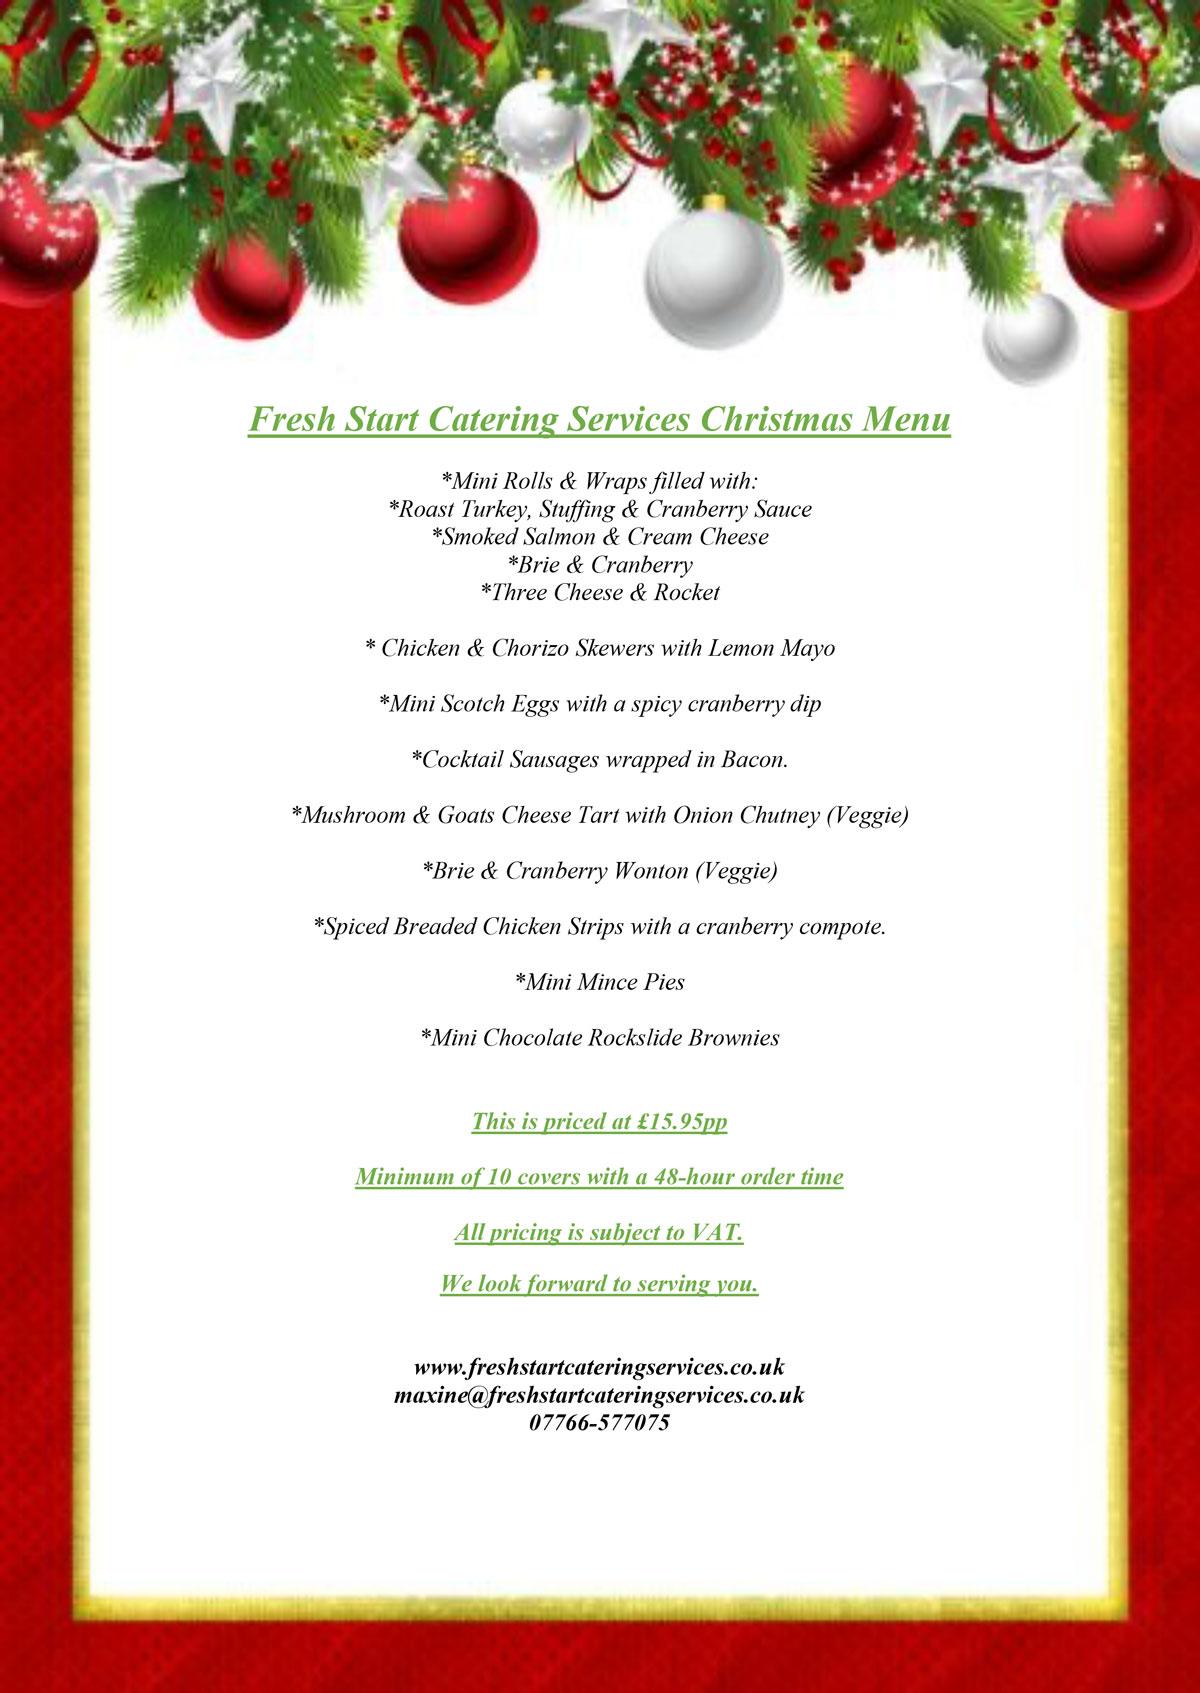 FSCS Christmas Menum202106